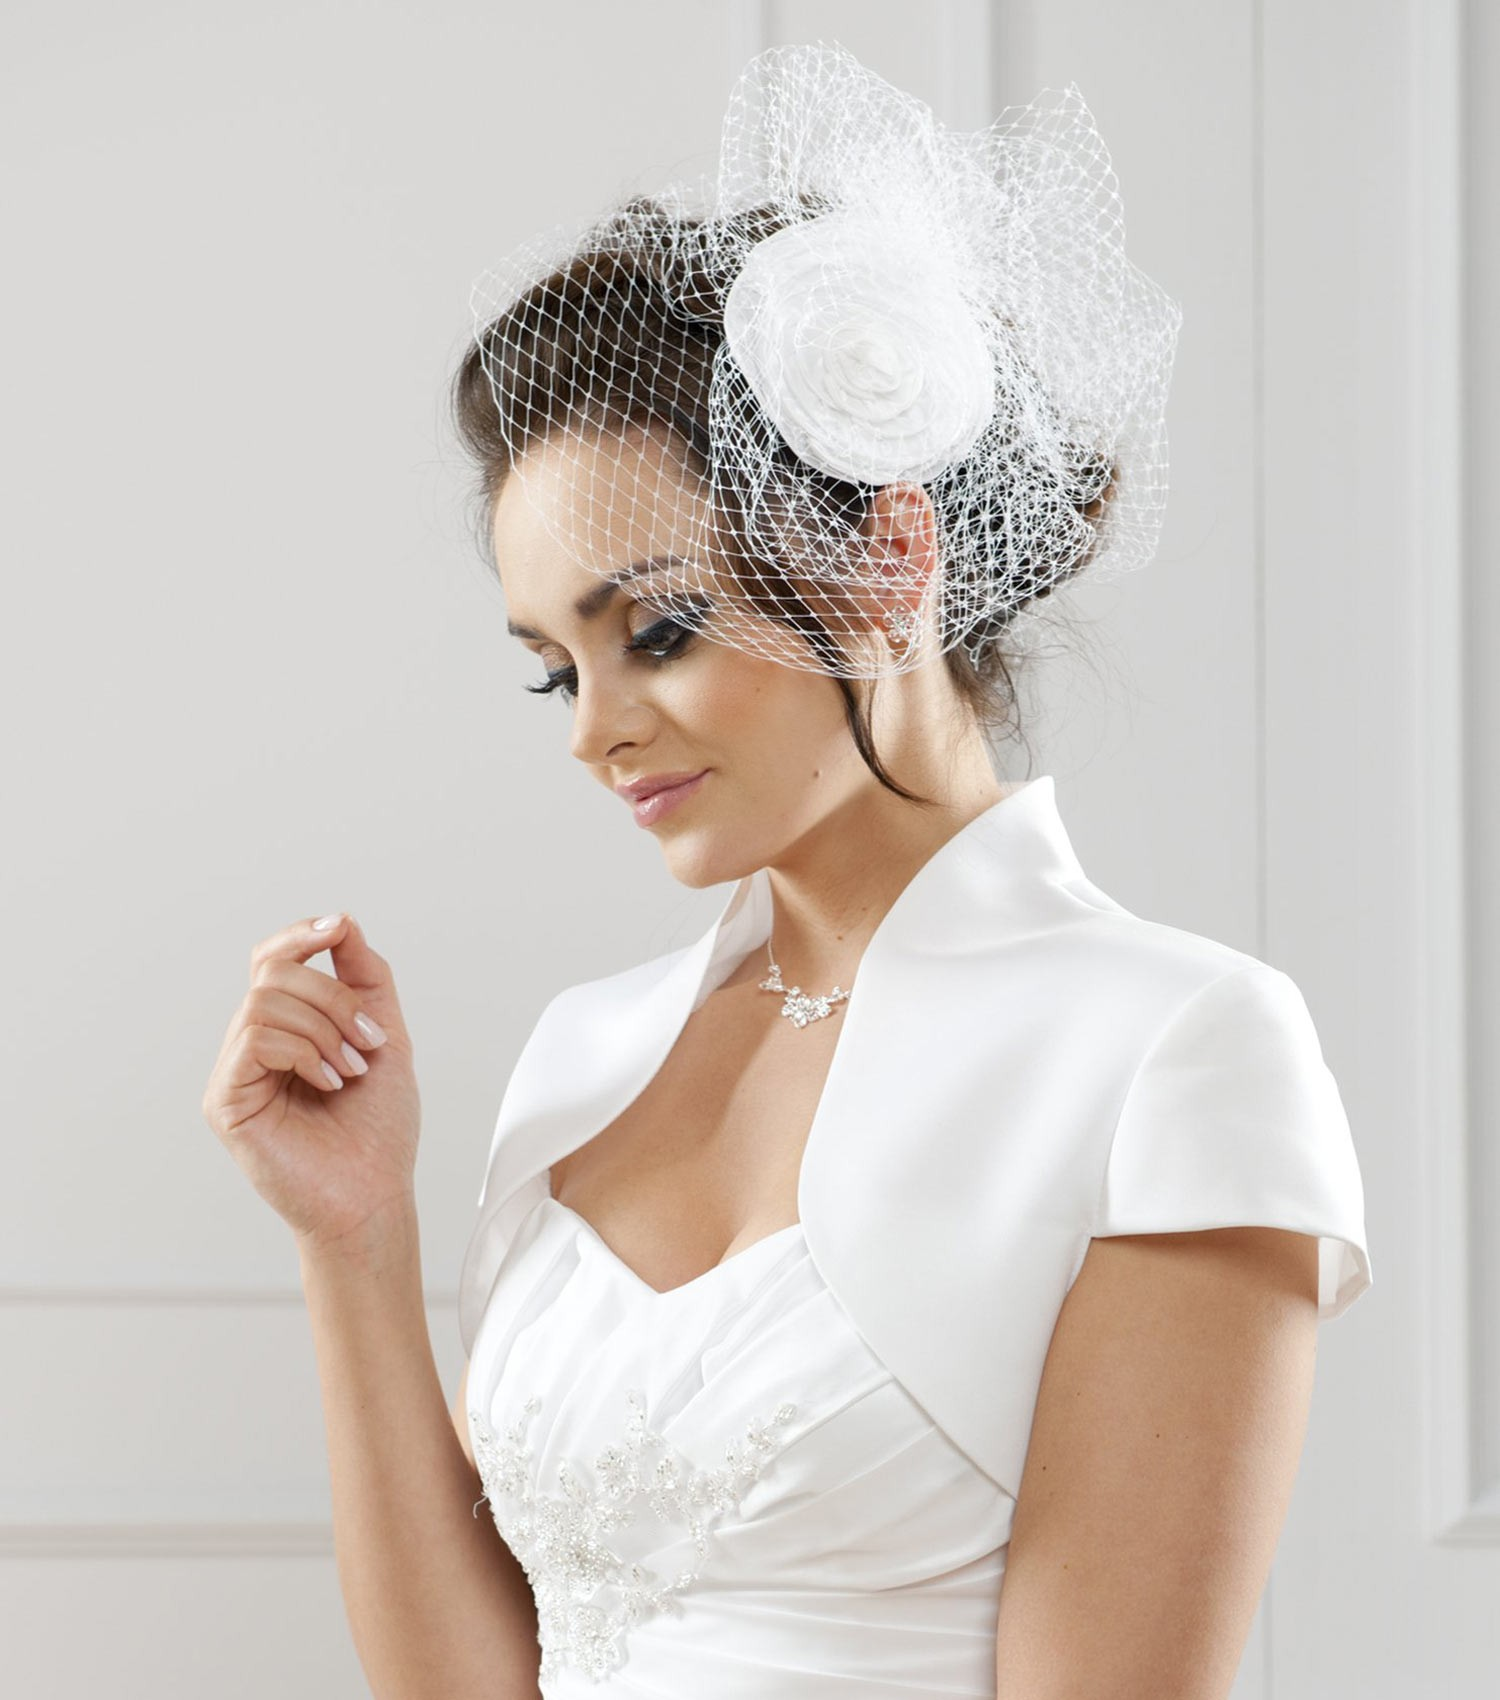 bolero mariage taffetas manches courtes giorgia - Bolero Mariage Blanc